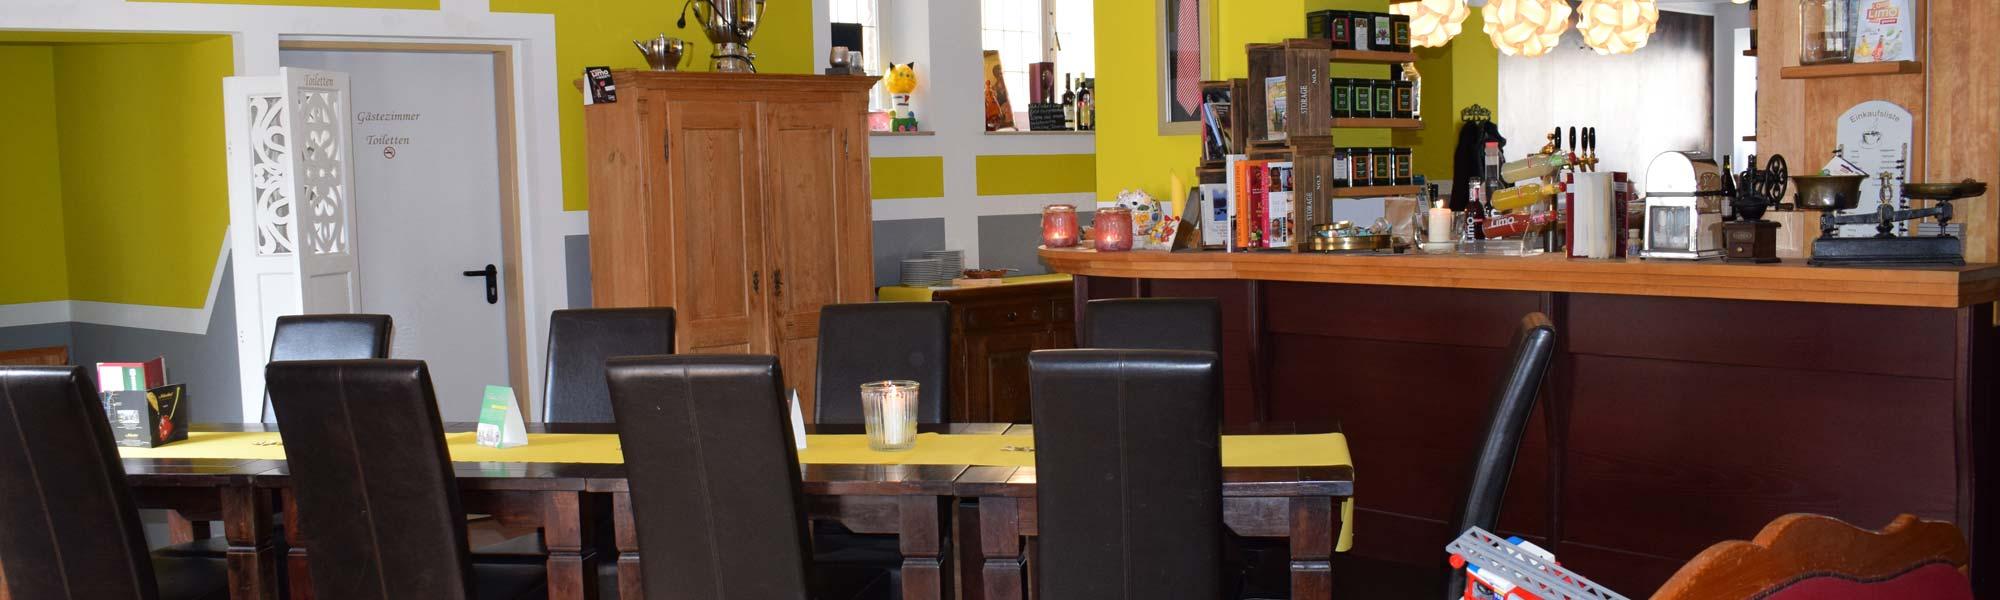 Zwiebelturm Restaurant